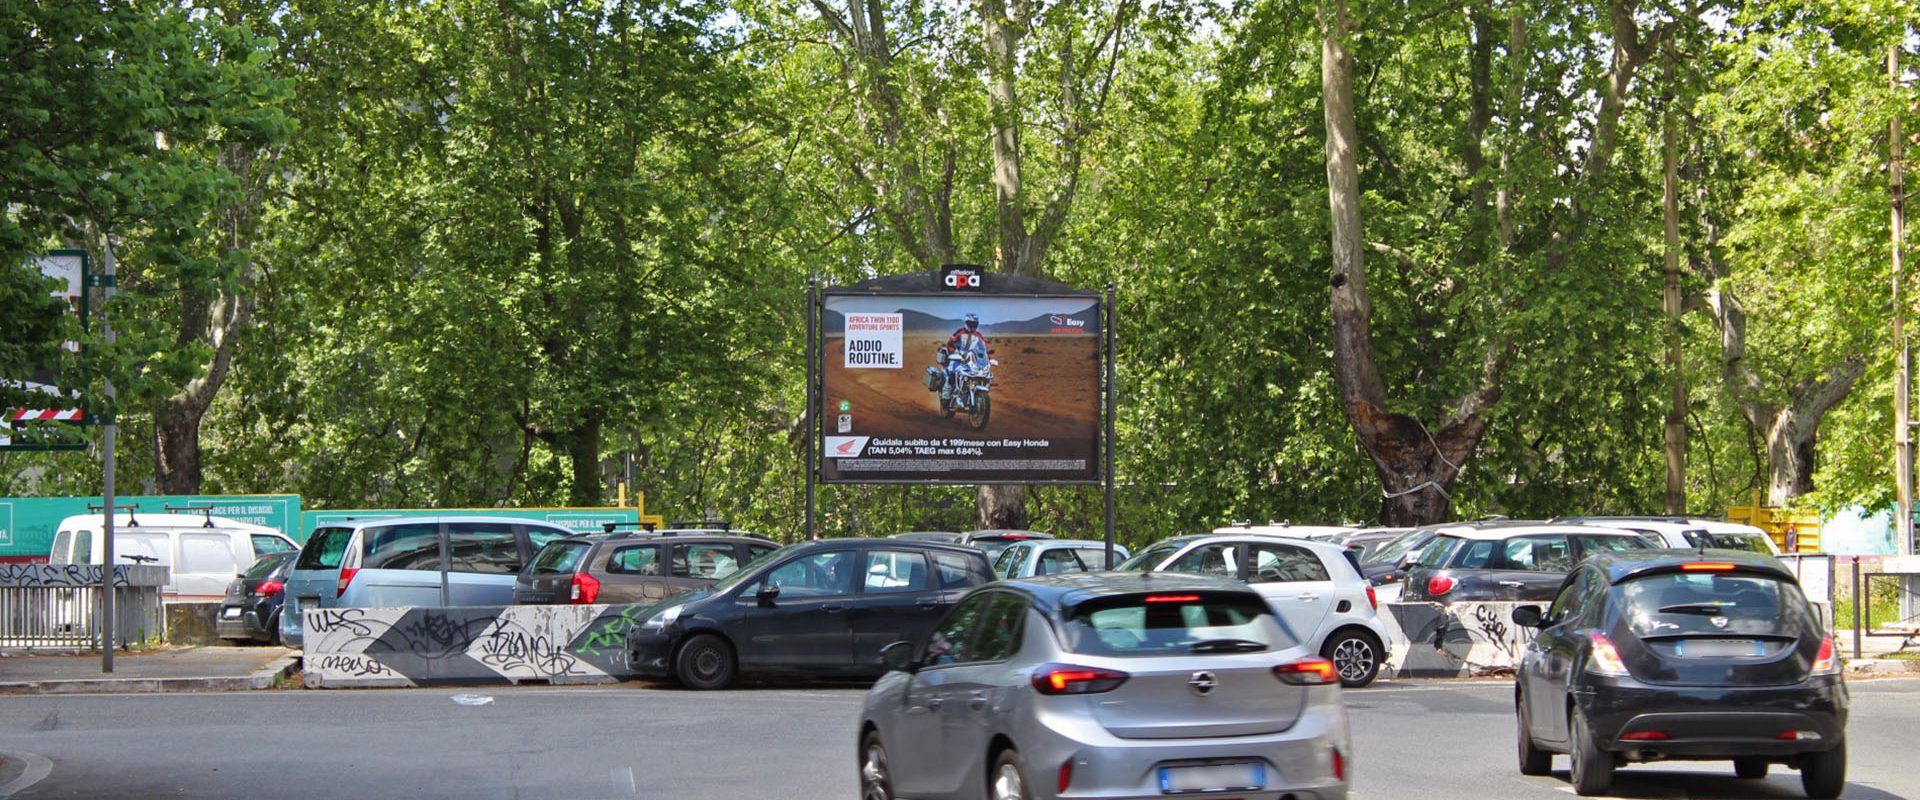 Affissione 3x2 di APA su Lungotevere.